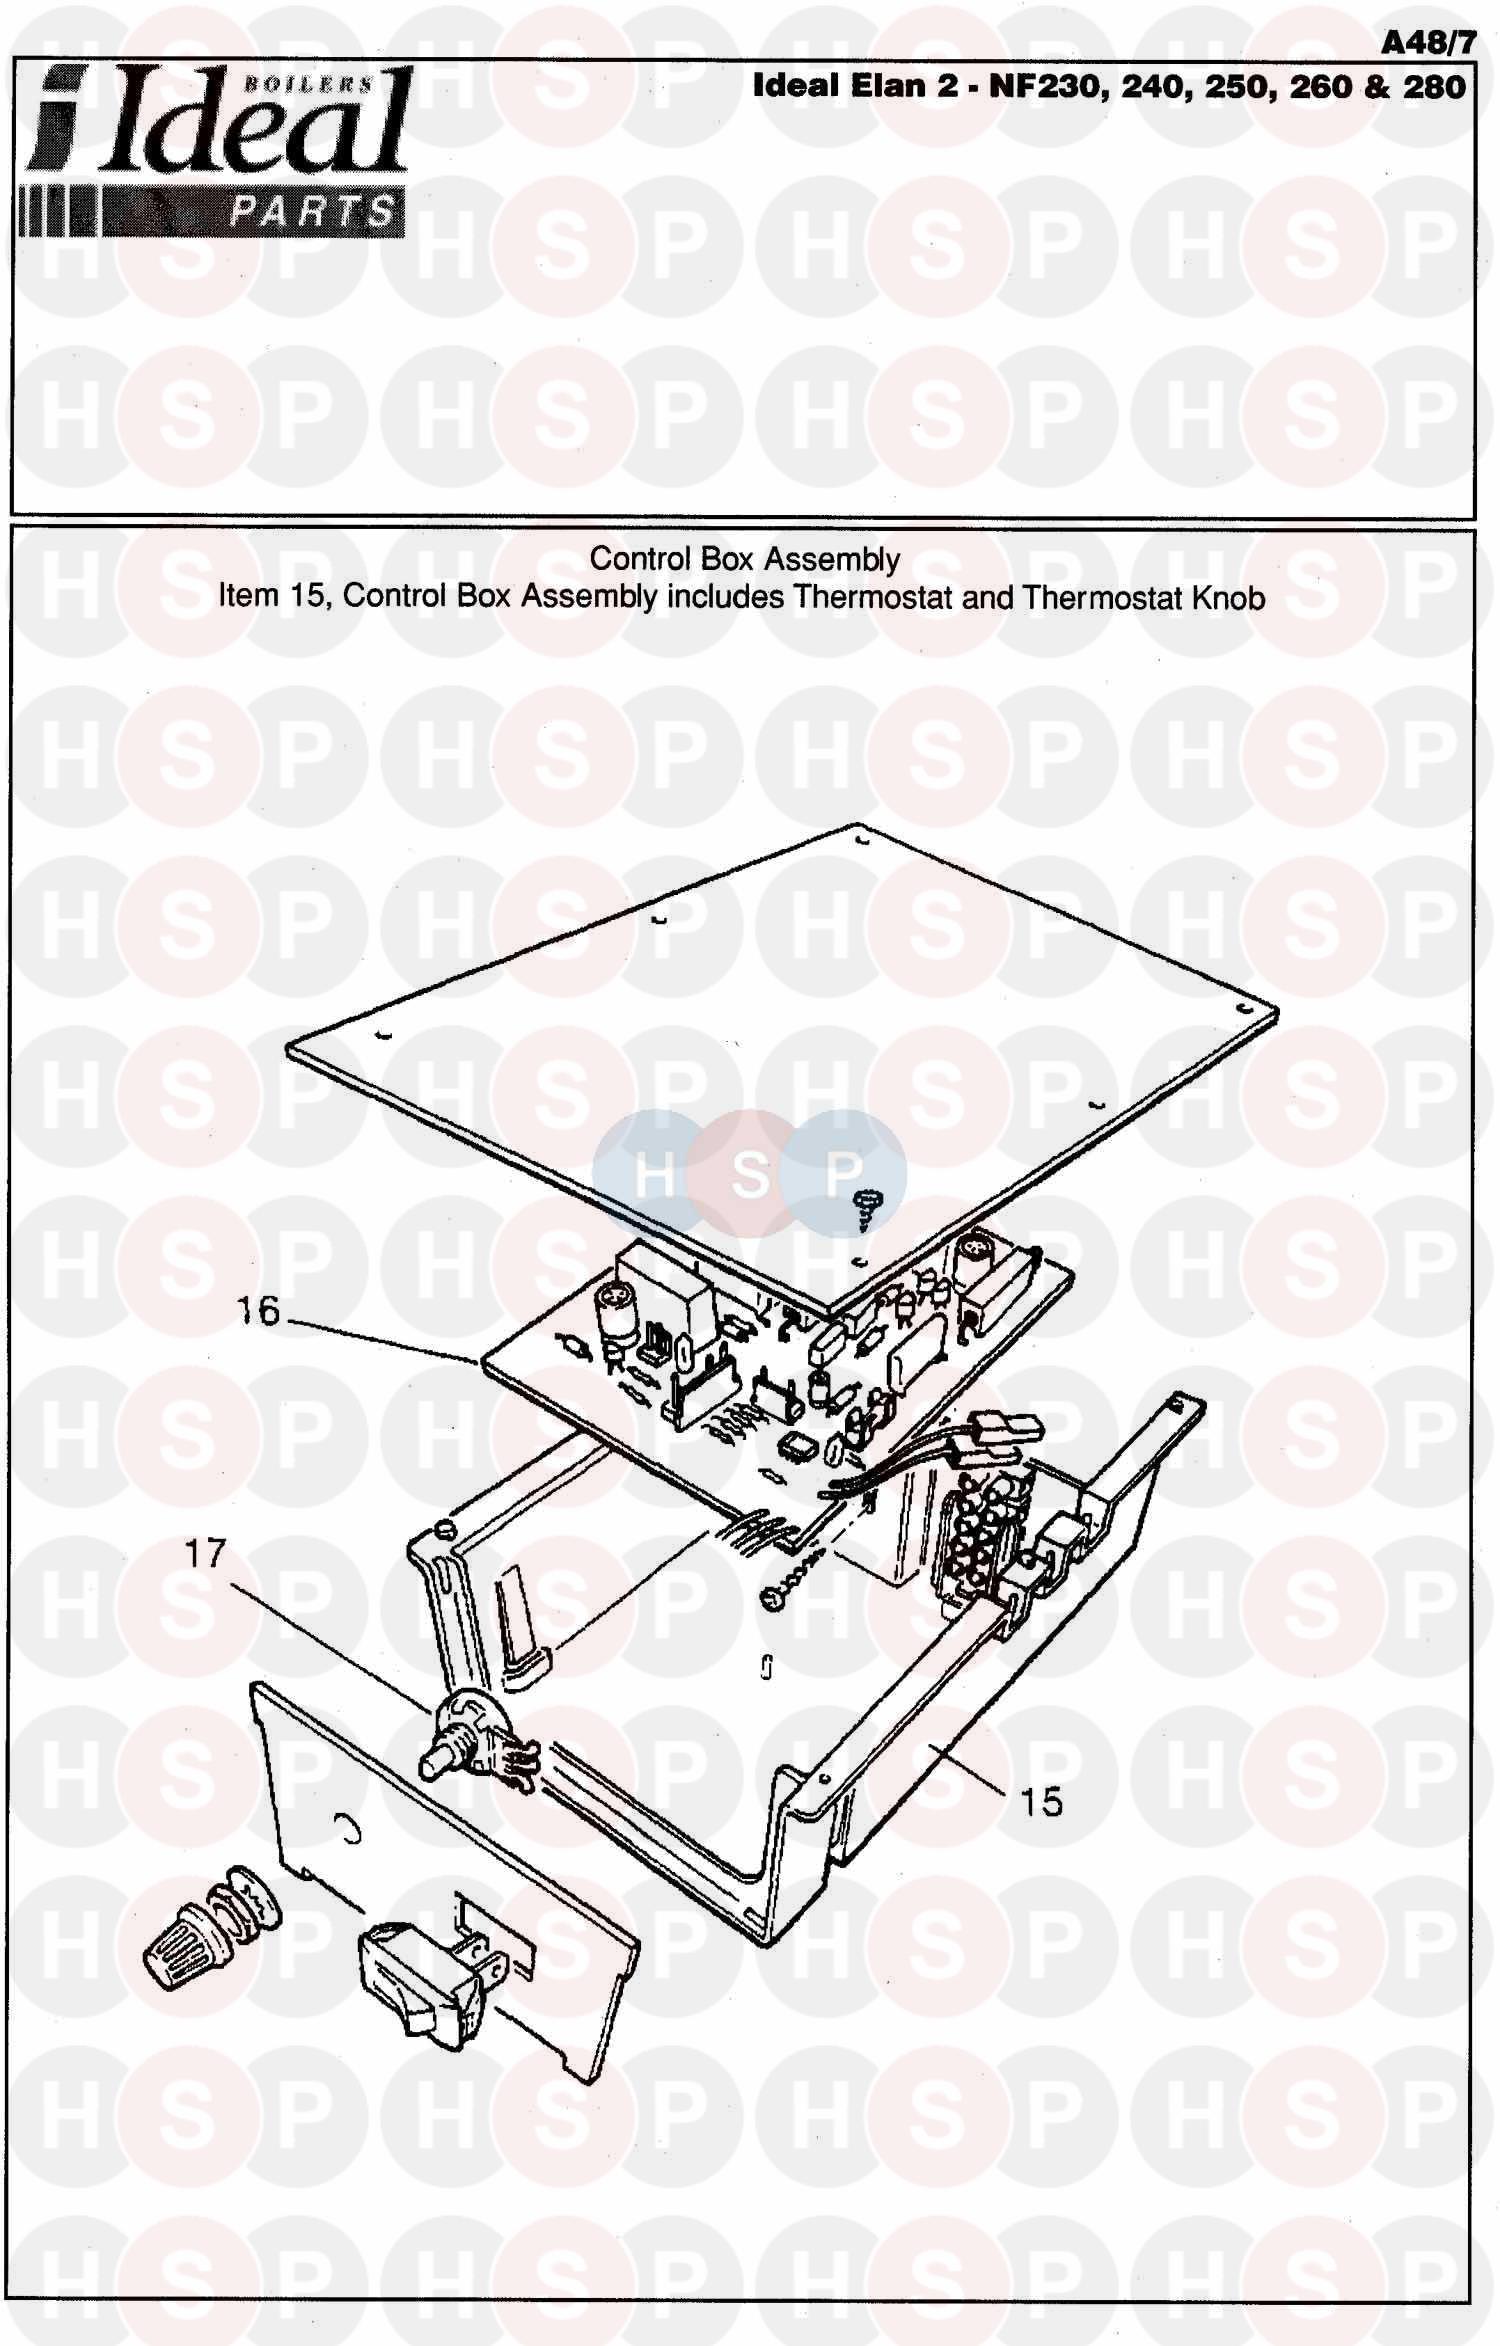 Ideal ELAN 2 NF 250 Appliance Diagram (Control Box Ass